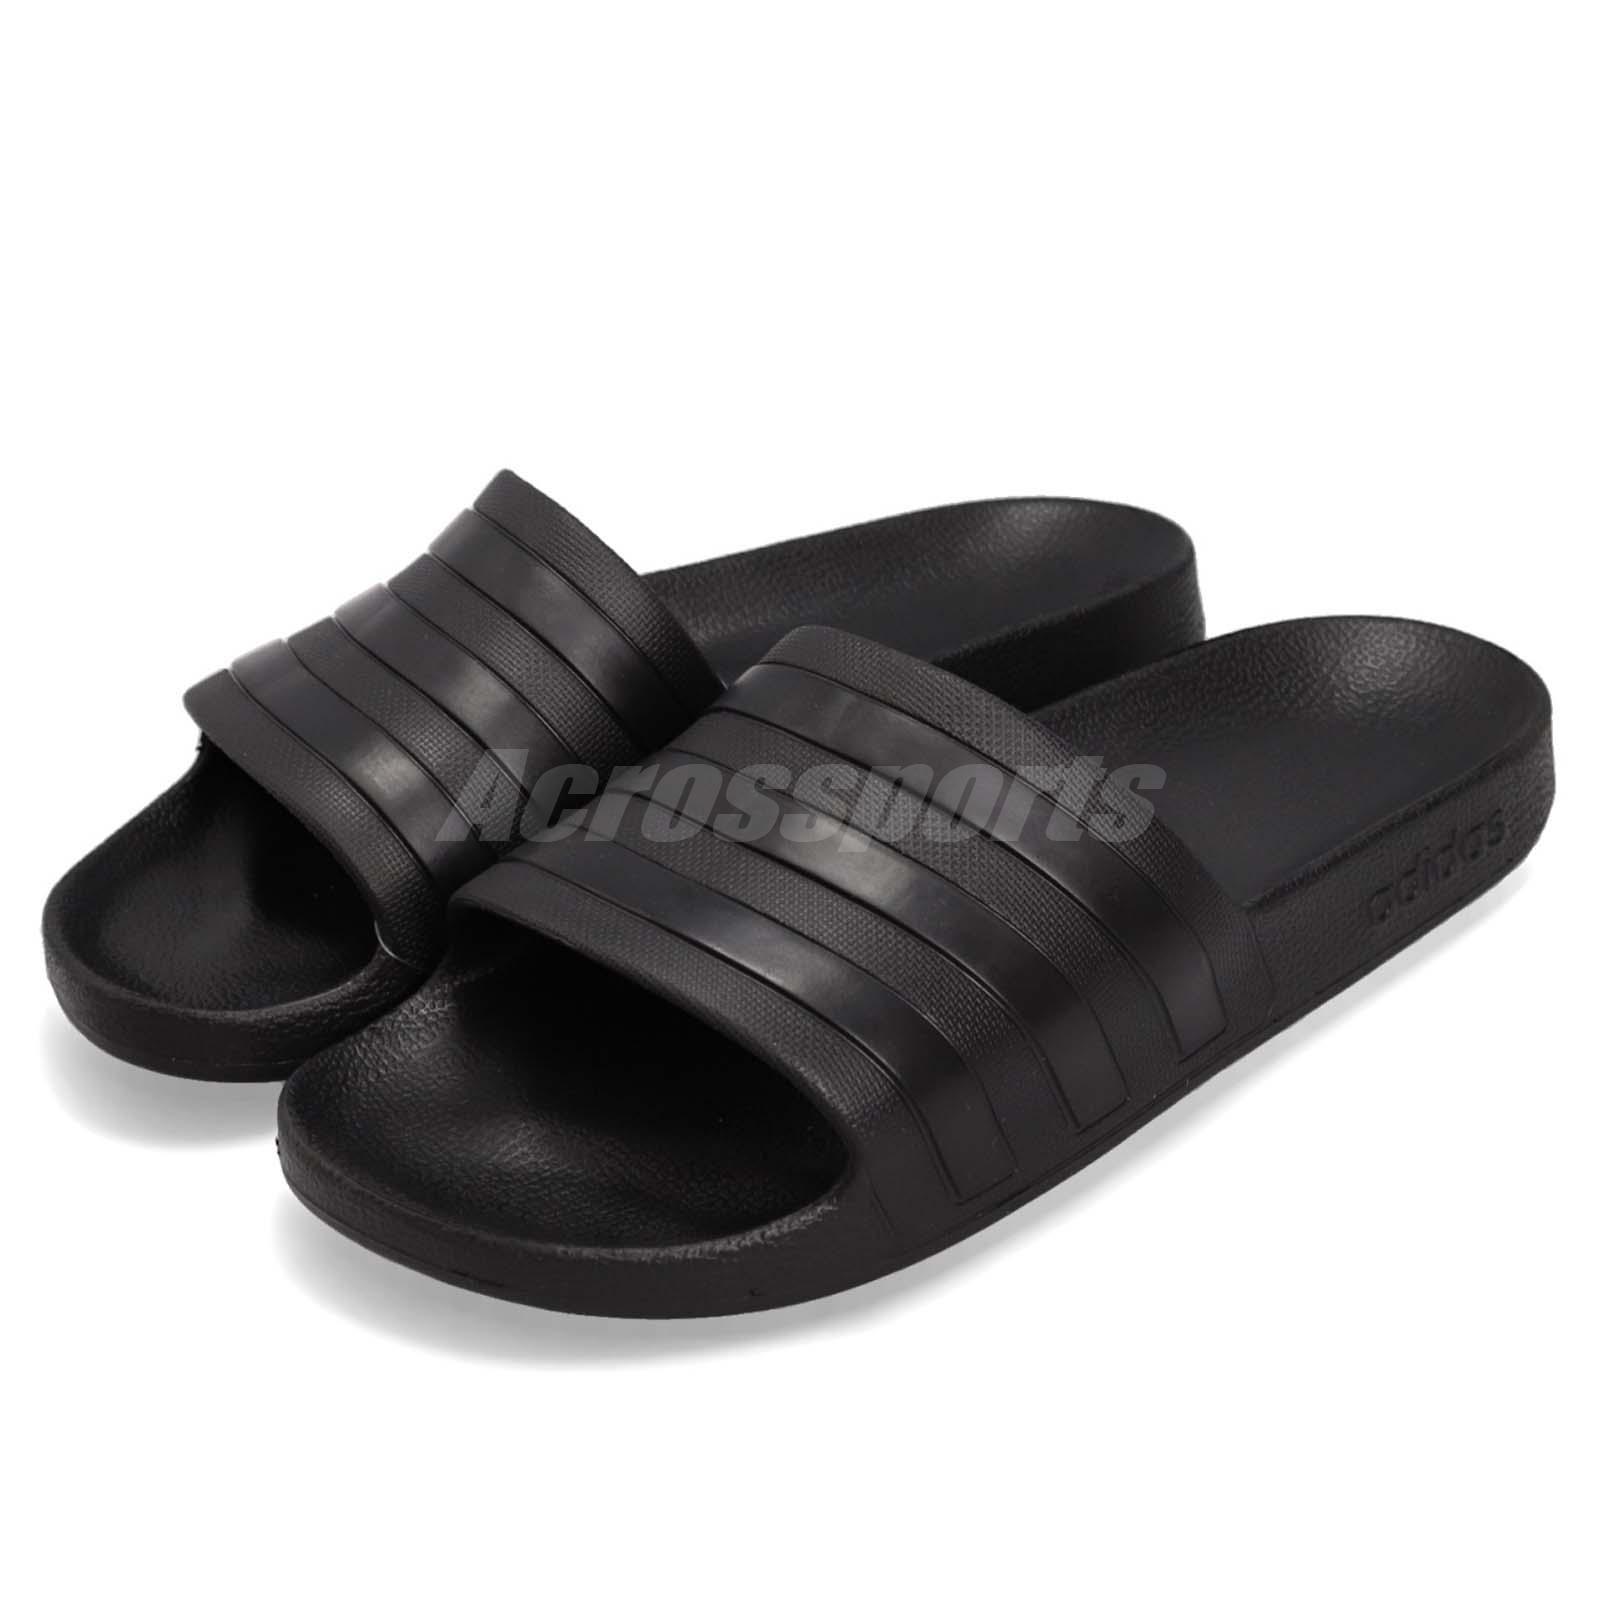 adidas black slippers - 63% remise